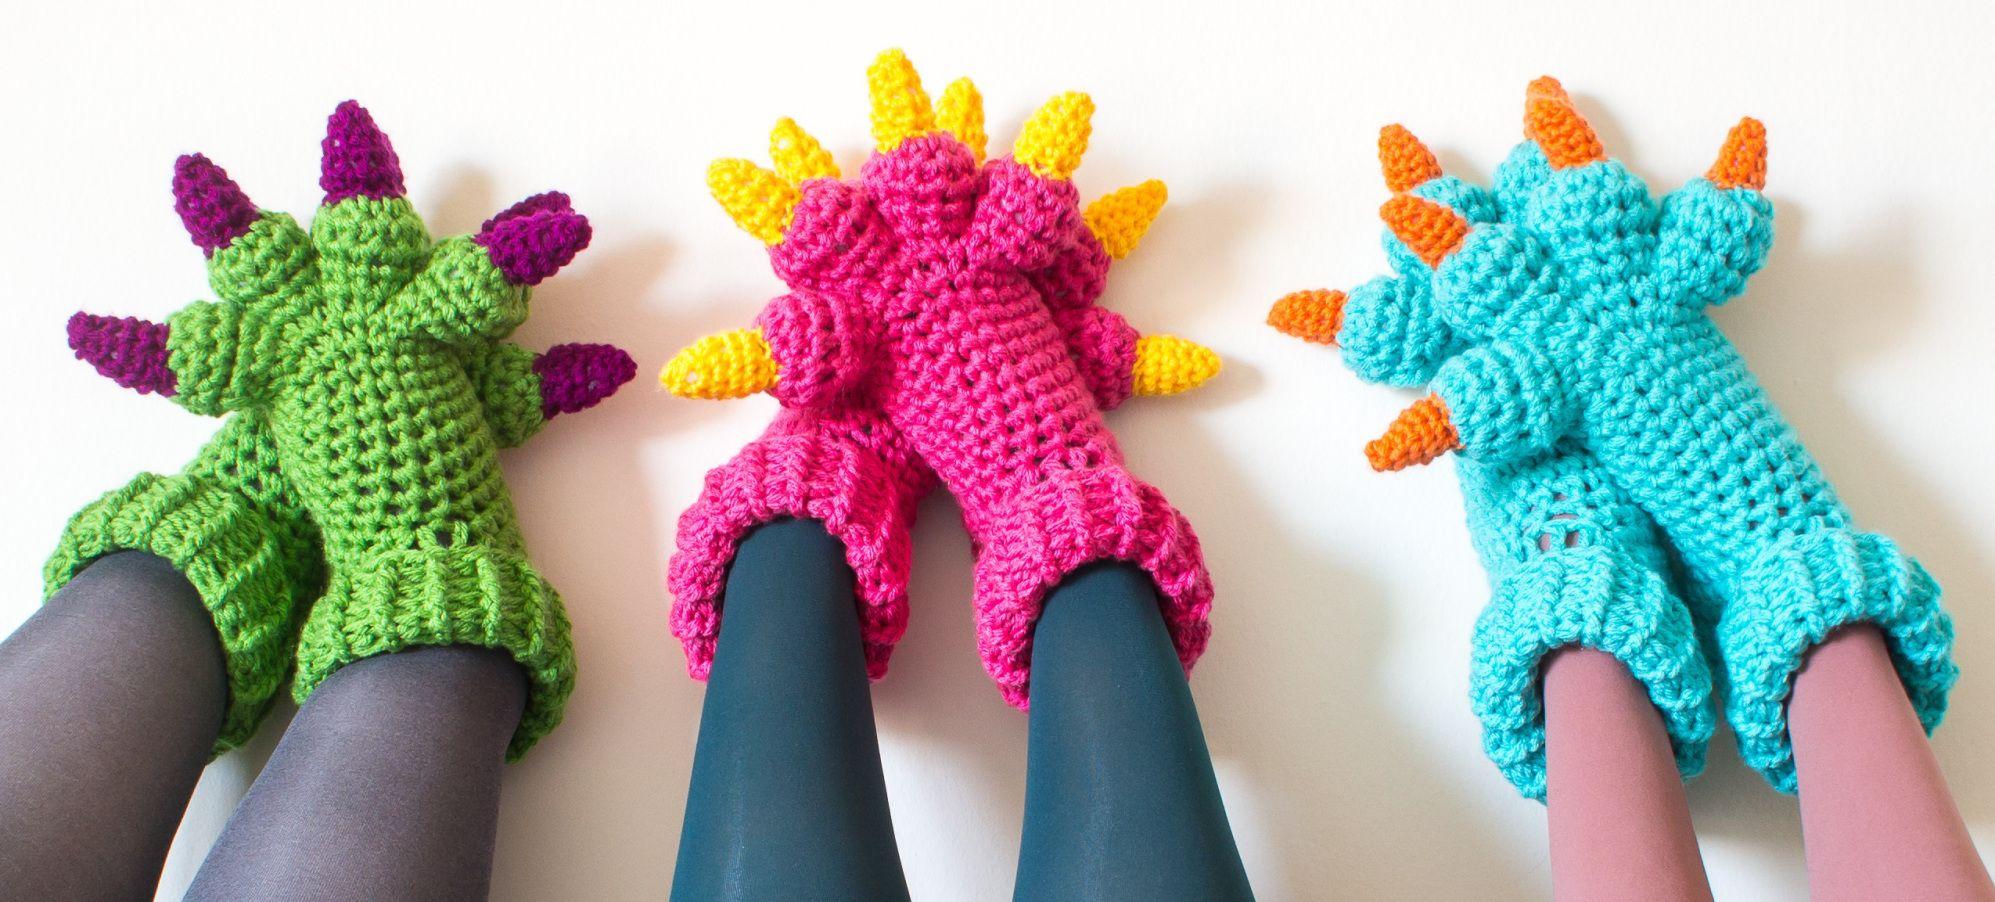 Monster Slippers Crochet Pattern Crocheted Croch Ganchillo